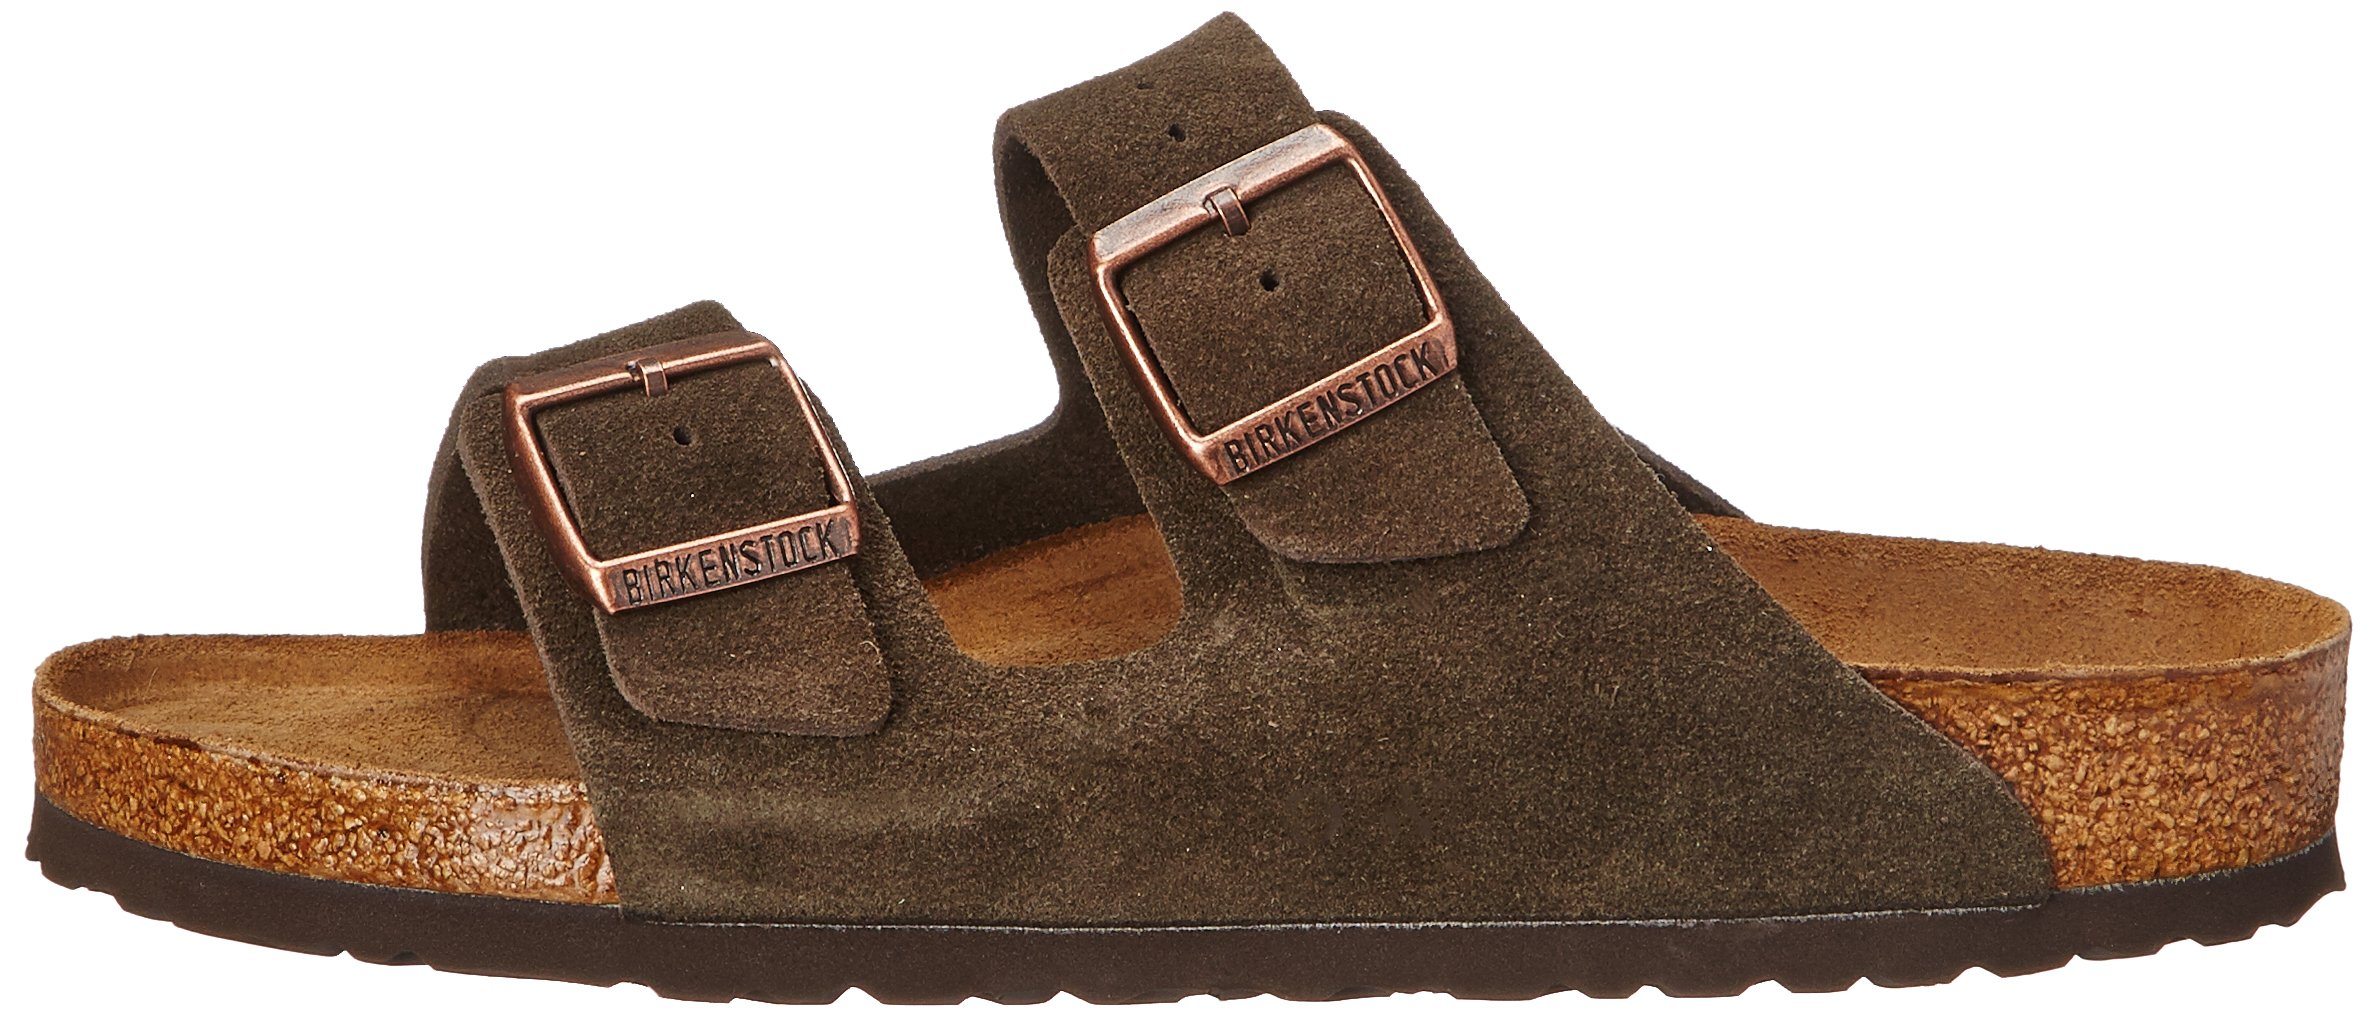 Birkenstock Unisex Arizona Mocha Suede Sandals - 35 N EU / 4-4.5 2A(N) US by Birkenstock (Image #5)